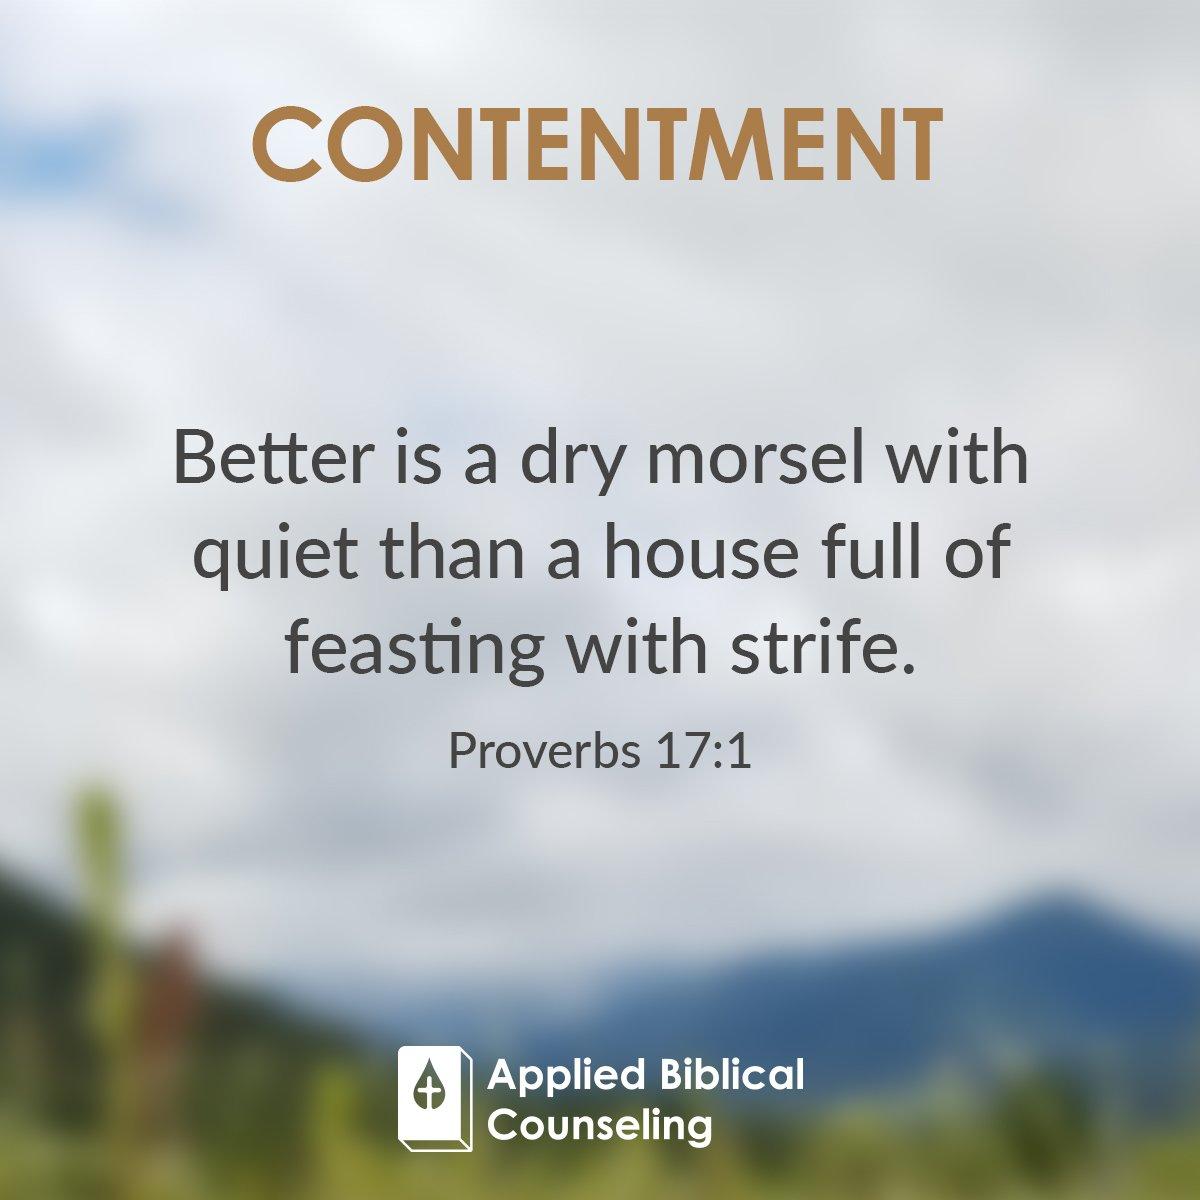 Contentment 4